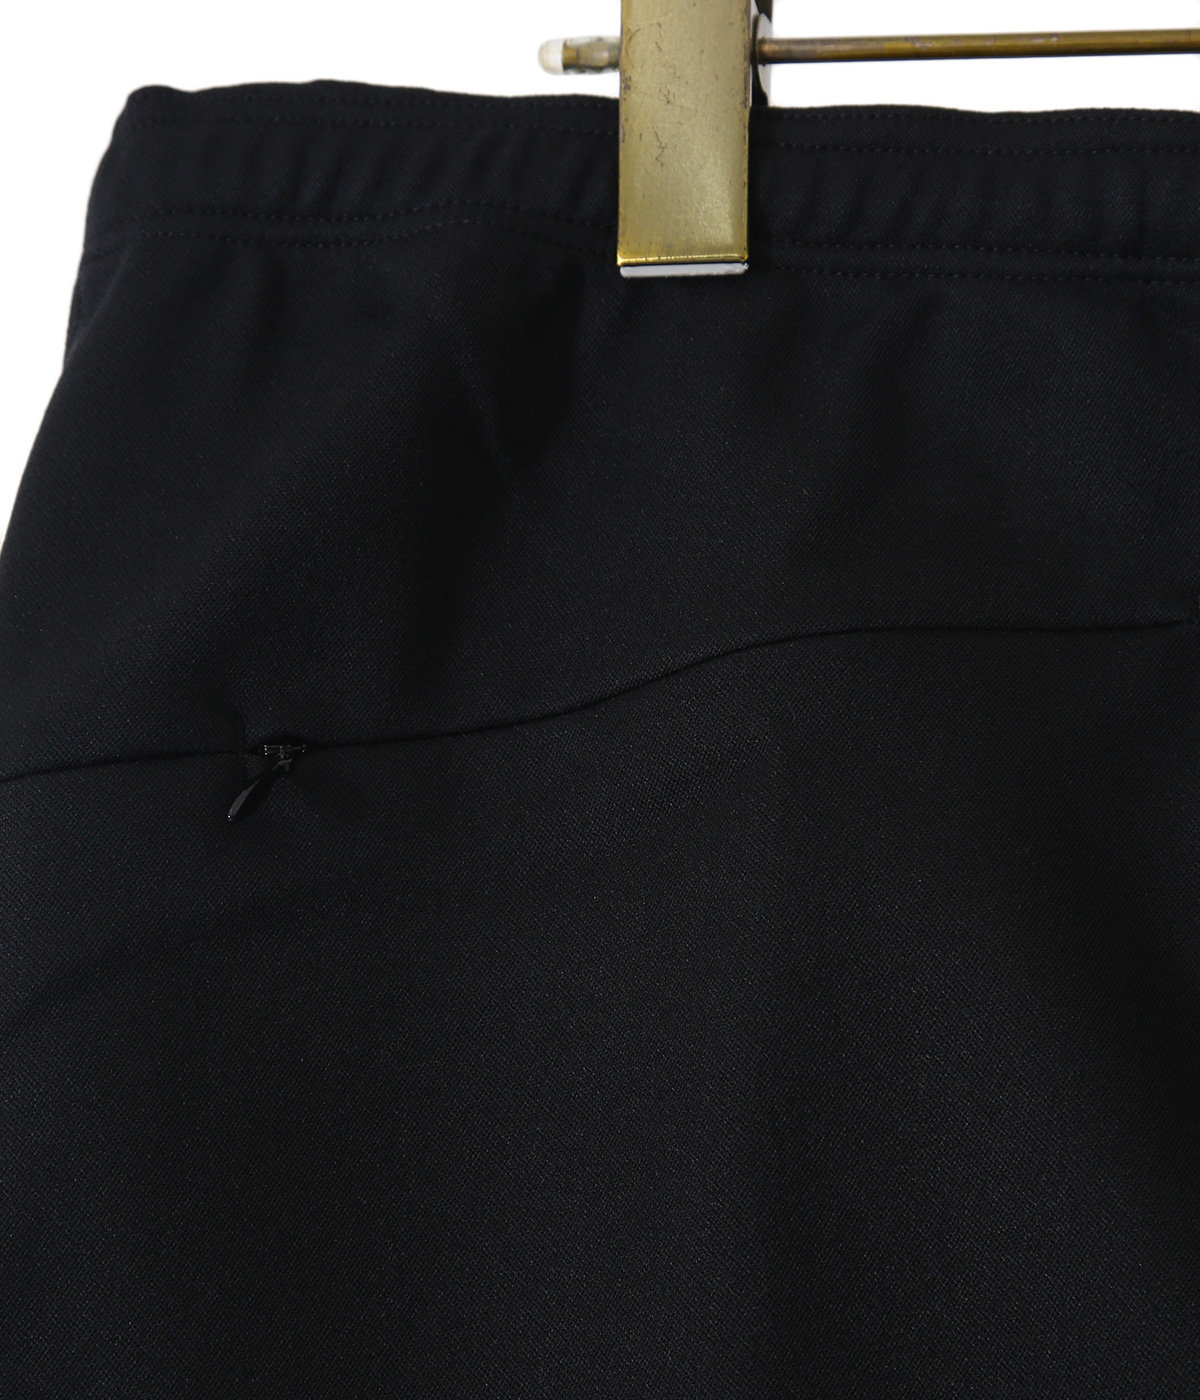 W.U. Boot-Cut Pant - Pe/R Doeskin